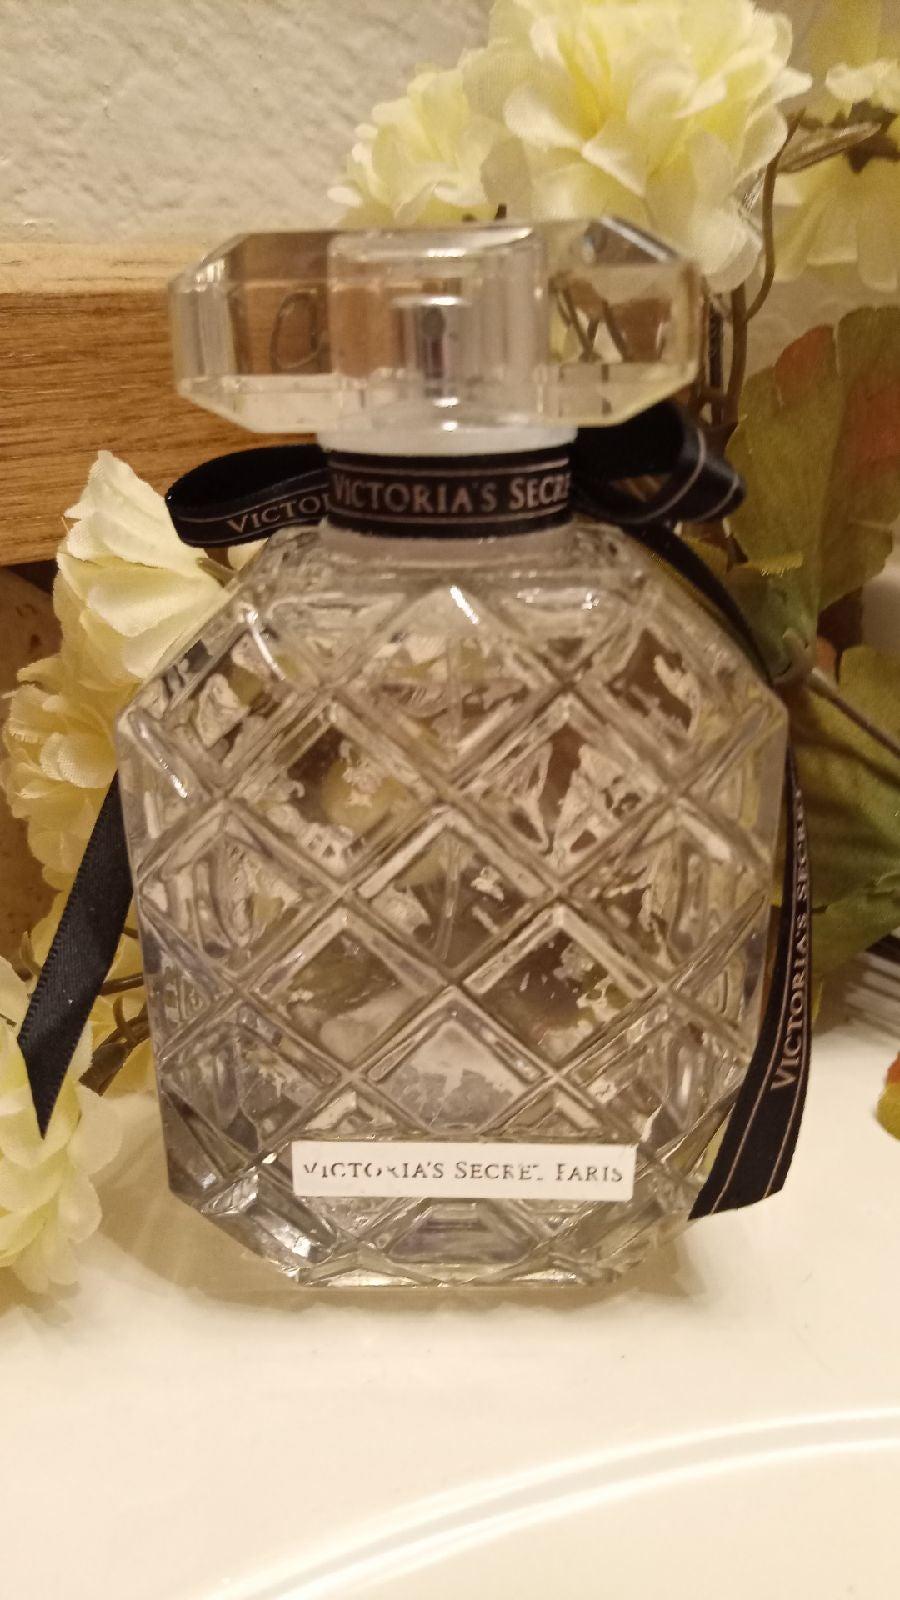 Bombshell Paris VS Perfume - Read on..